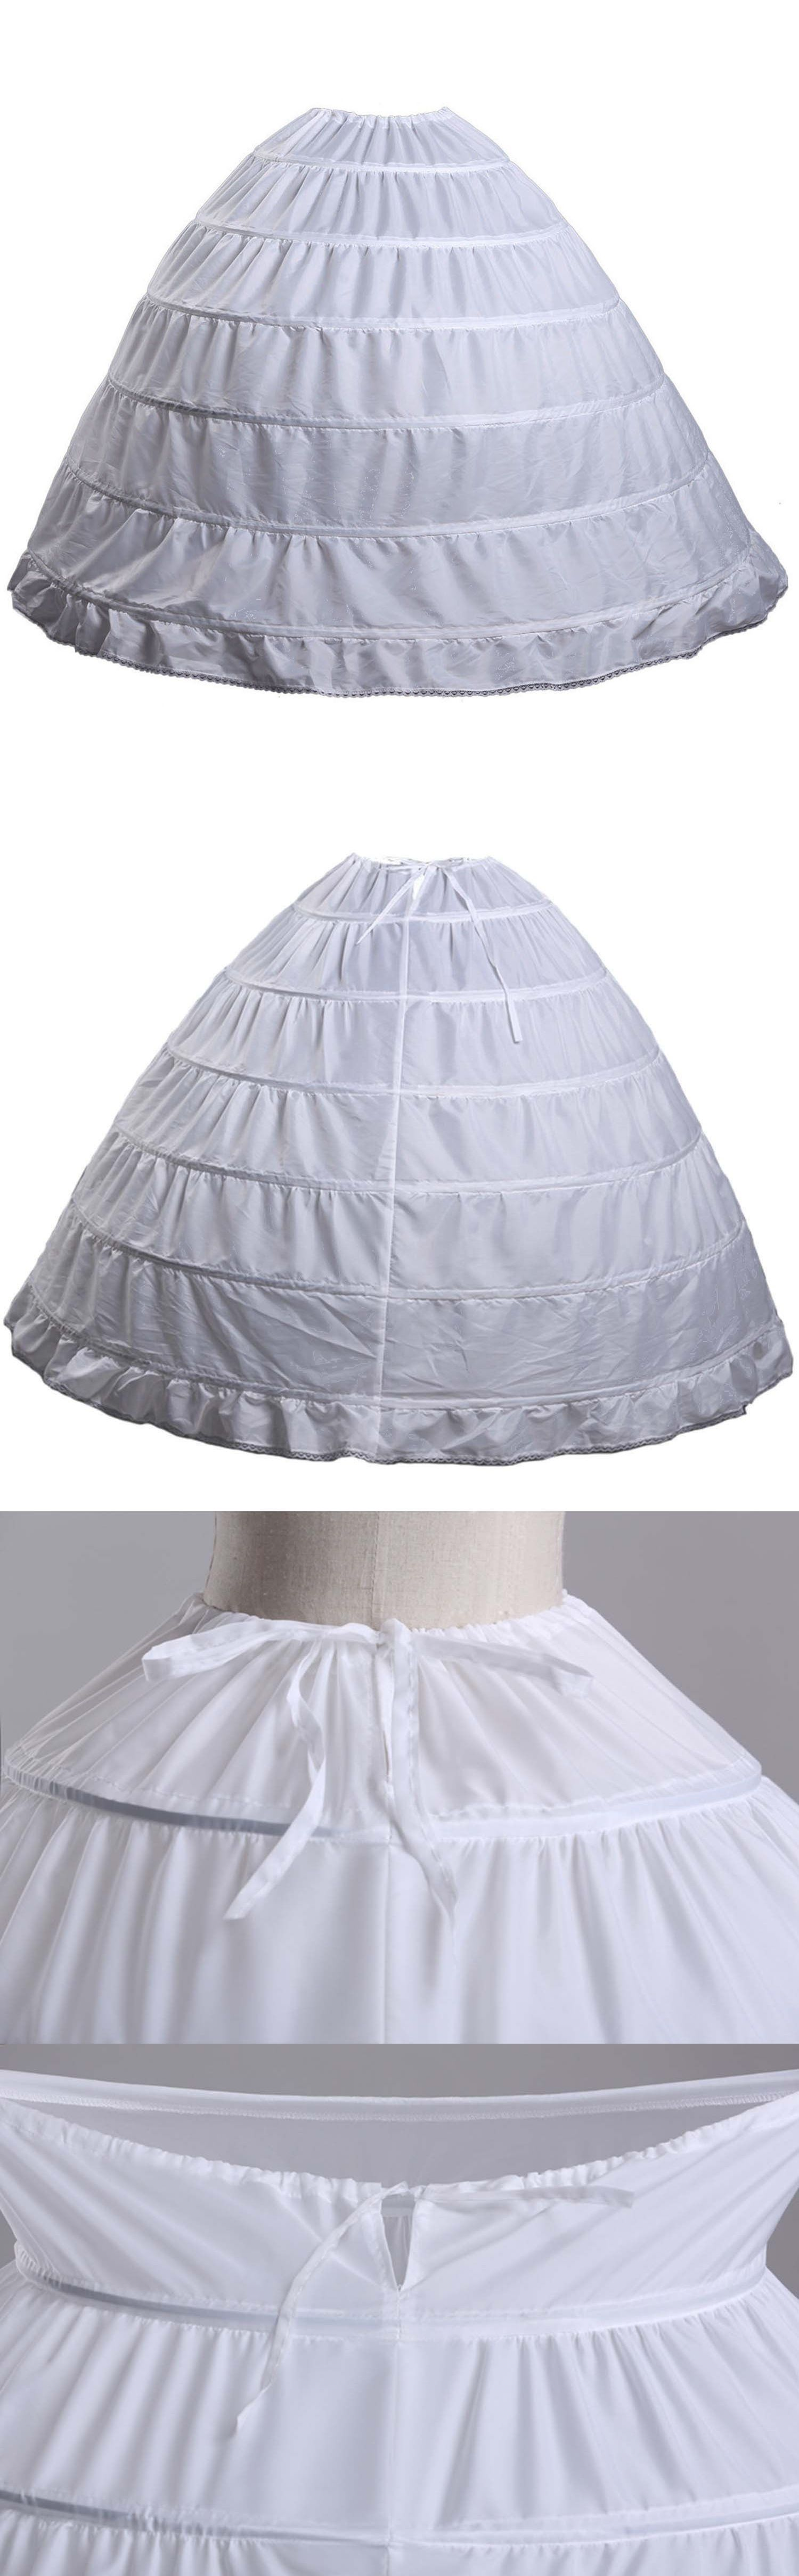 Slips Petticoats and Hoops 98745: Fanhao Hoop Skirt Wedding Dress ...